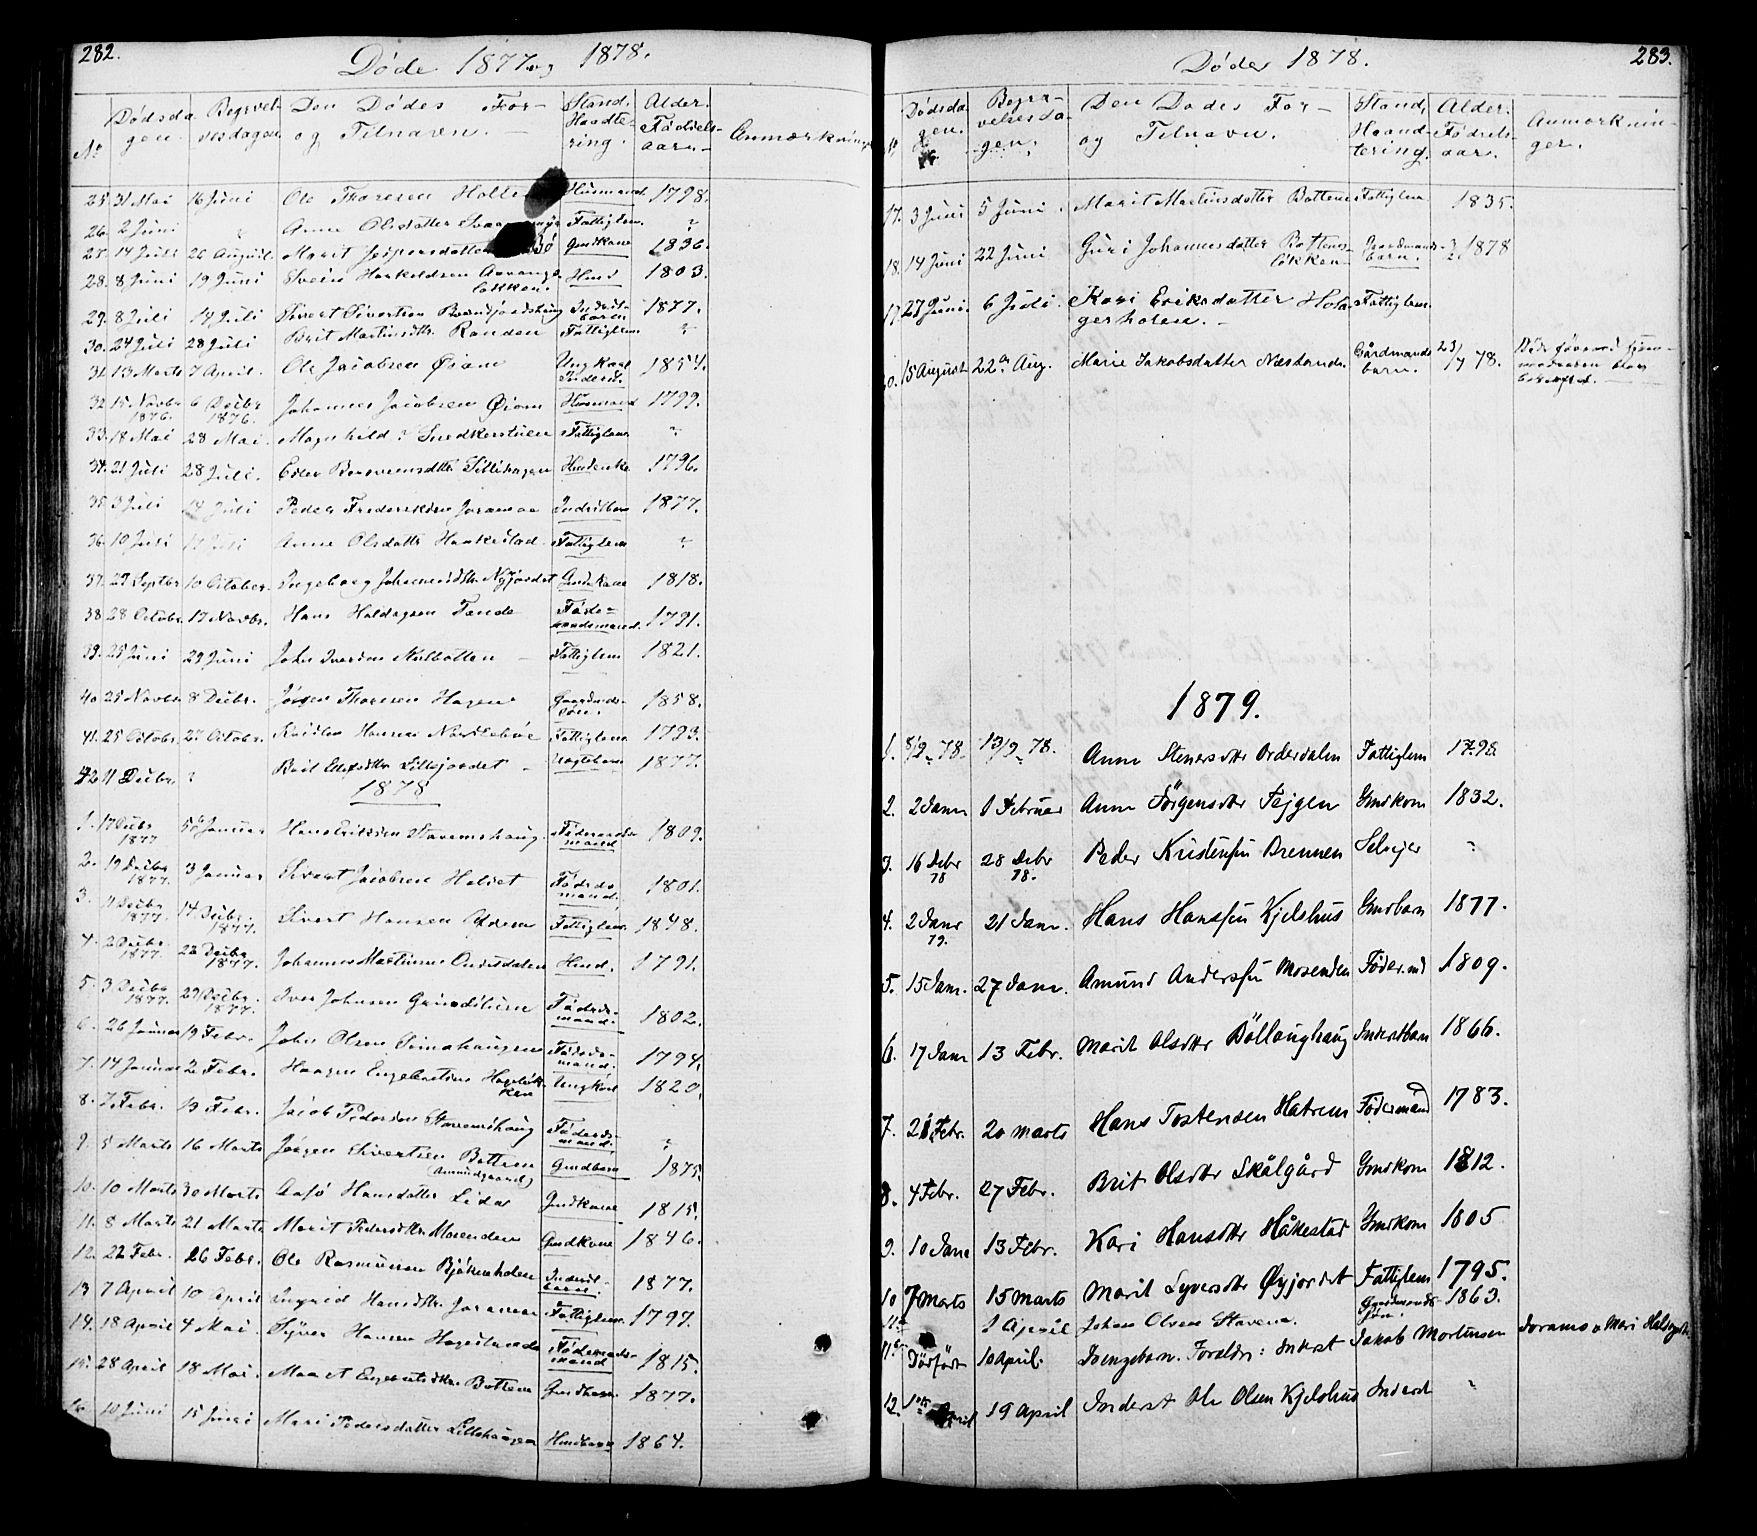 SAH, Lesja prestekontor, Klokkerbok nr. 5, 1850-1894, s. 282-283